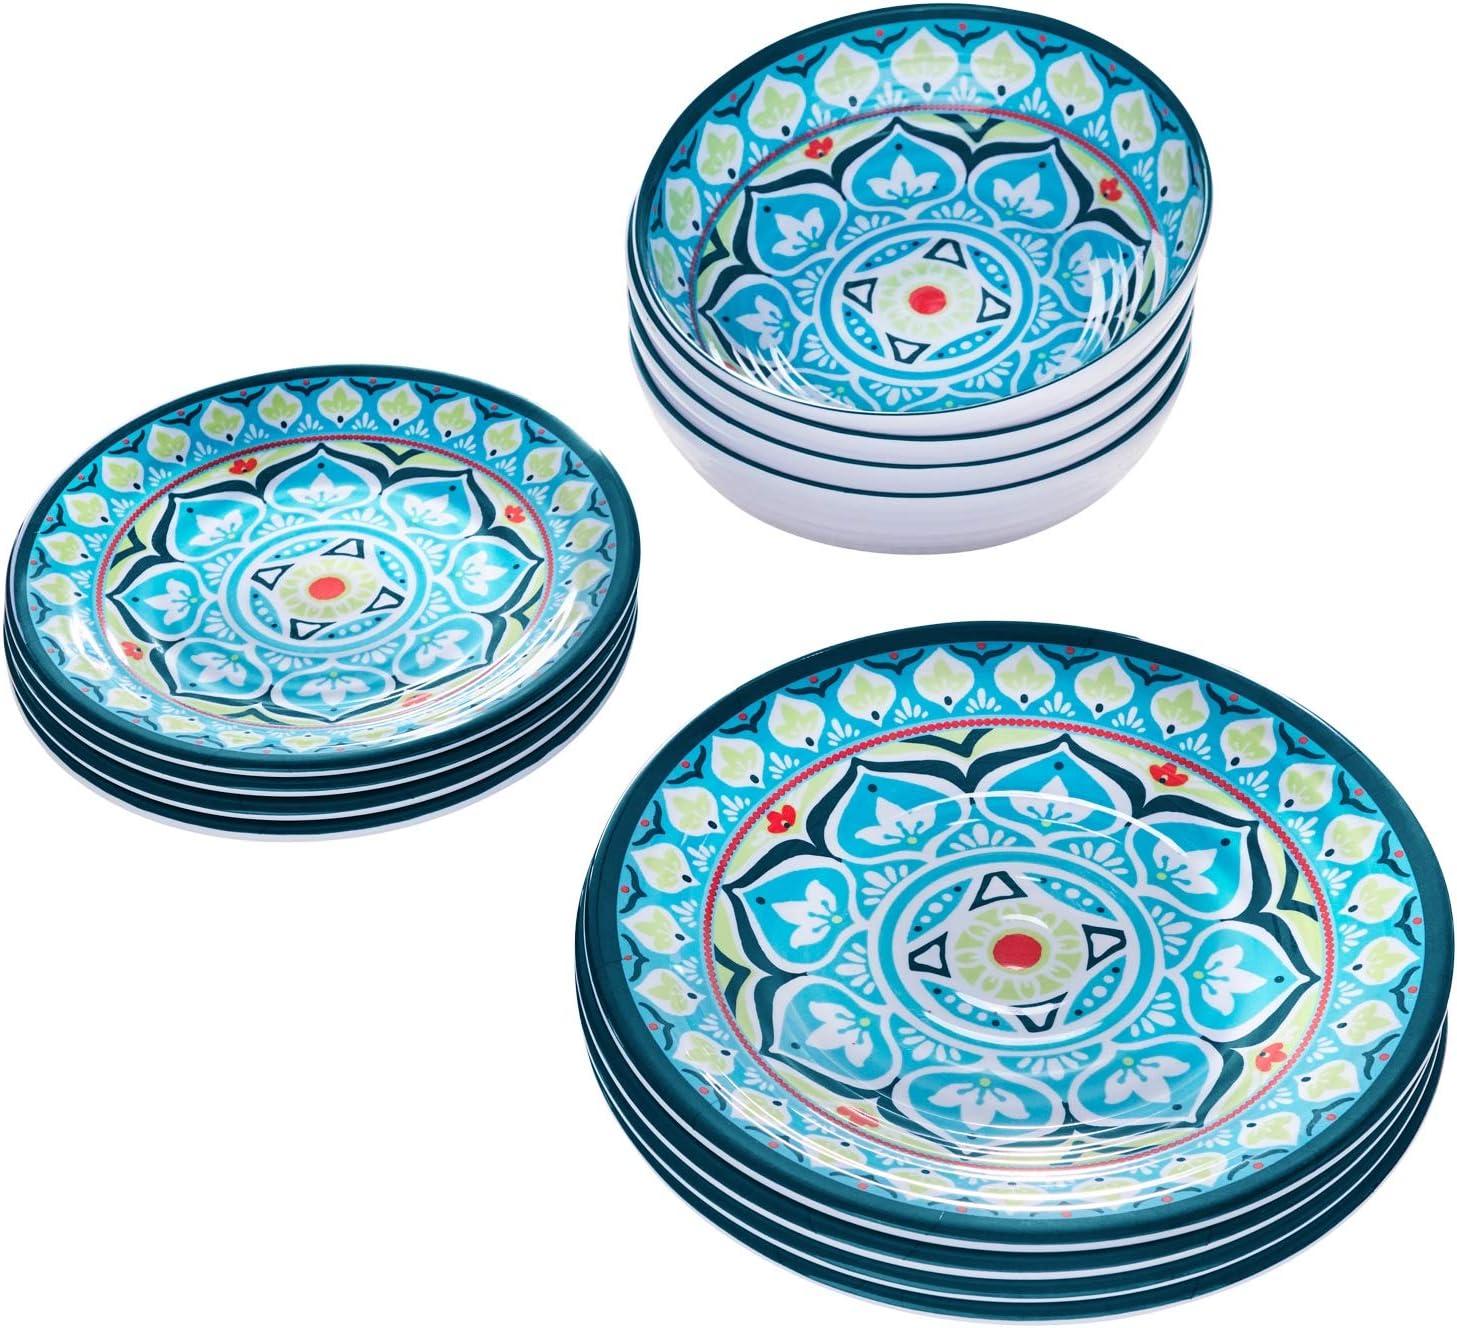 BrylaneHome Blue Casab Melamine 12 online shop Dinnerware Outlet SALE O Piece Set Multi